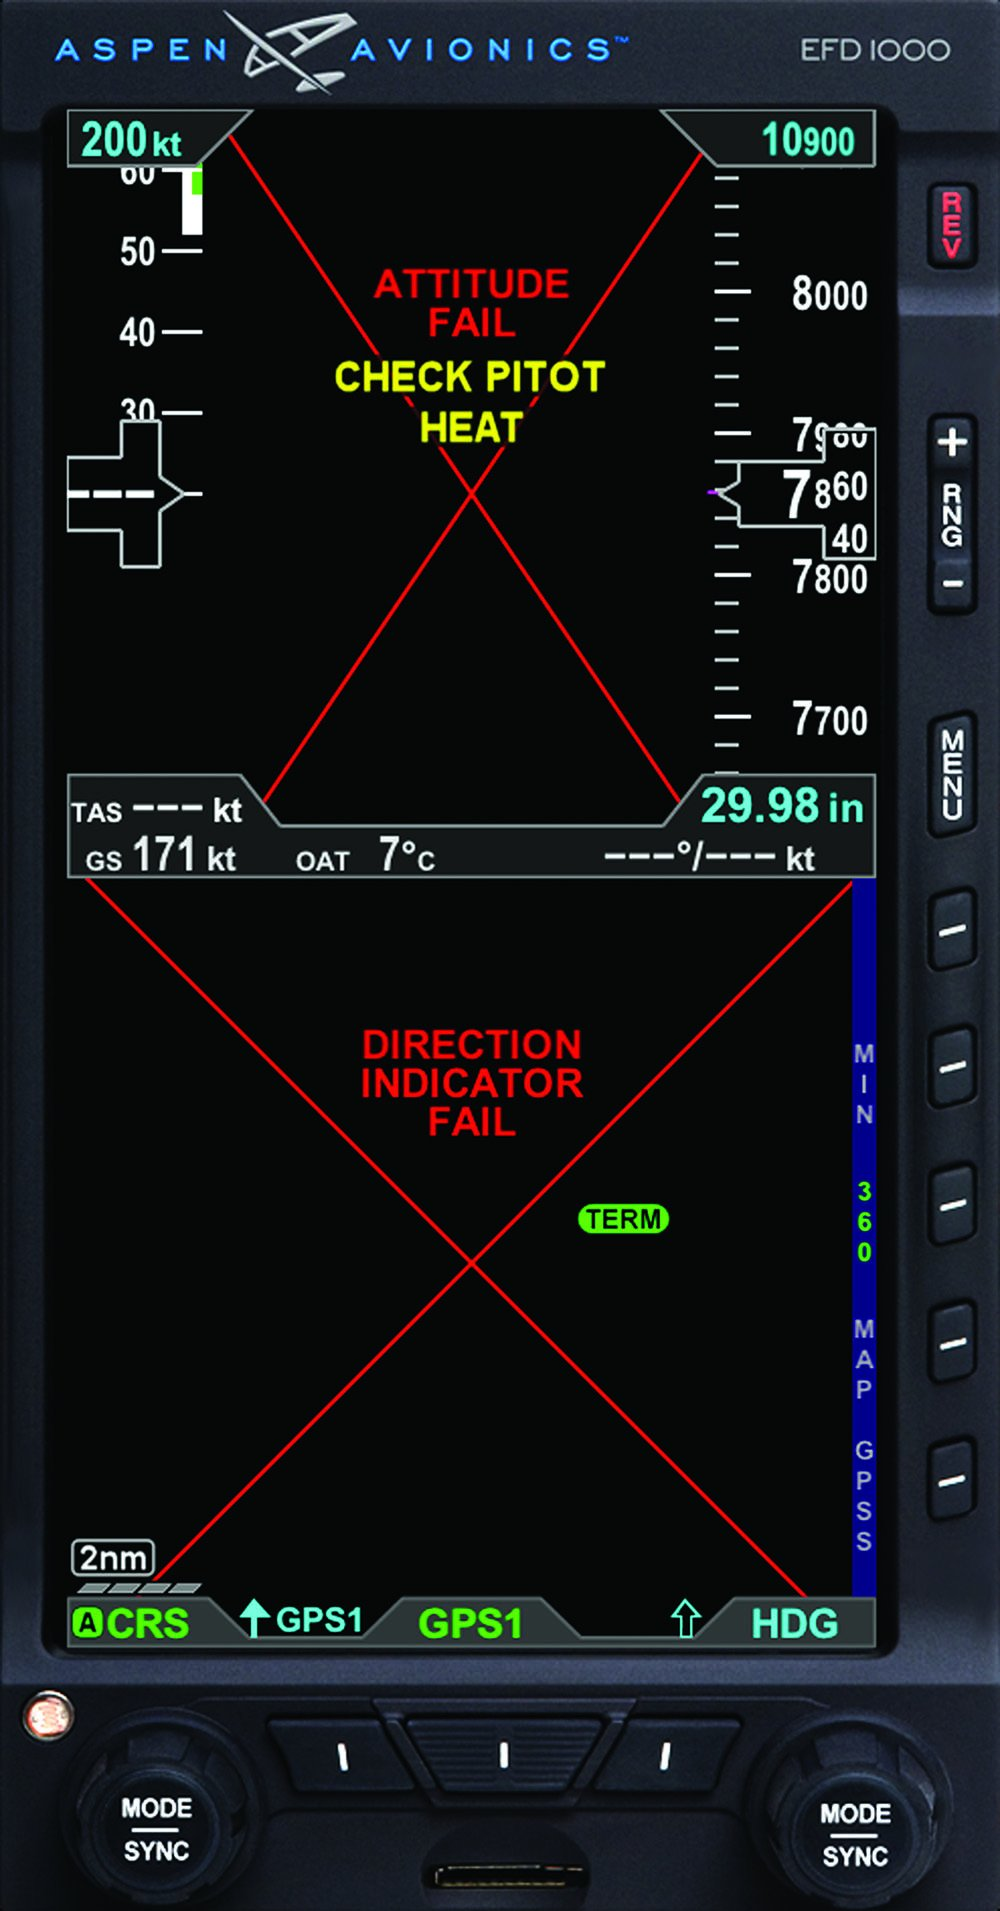 Aspen Avionics pitot input fail